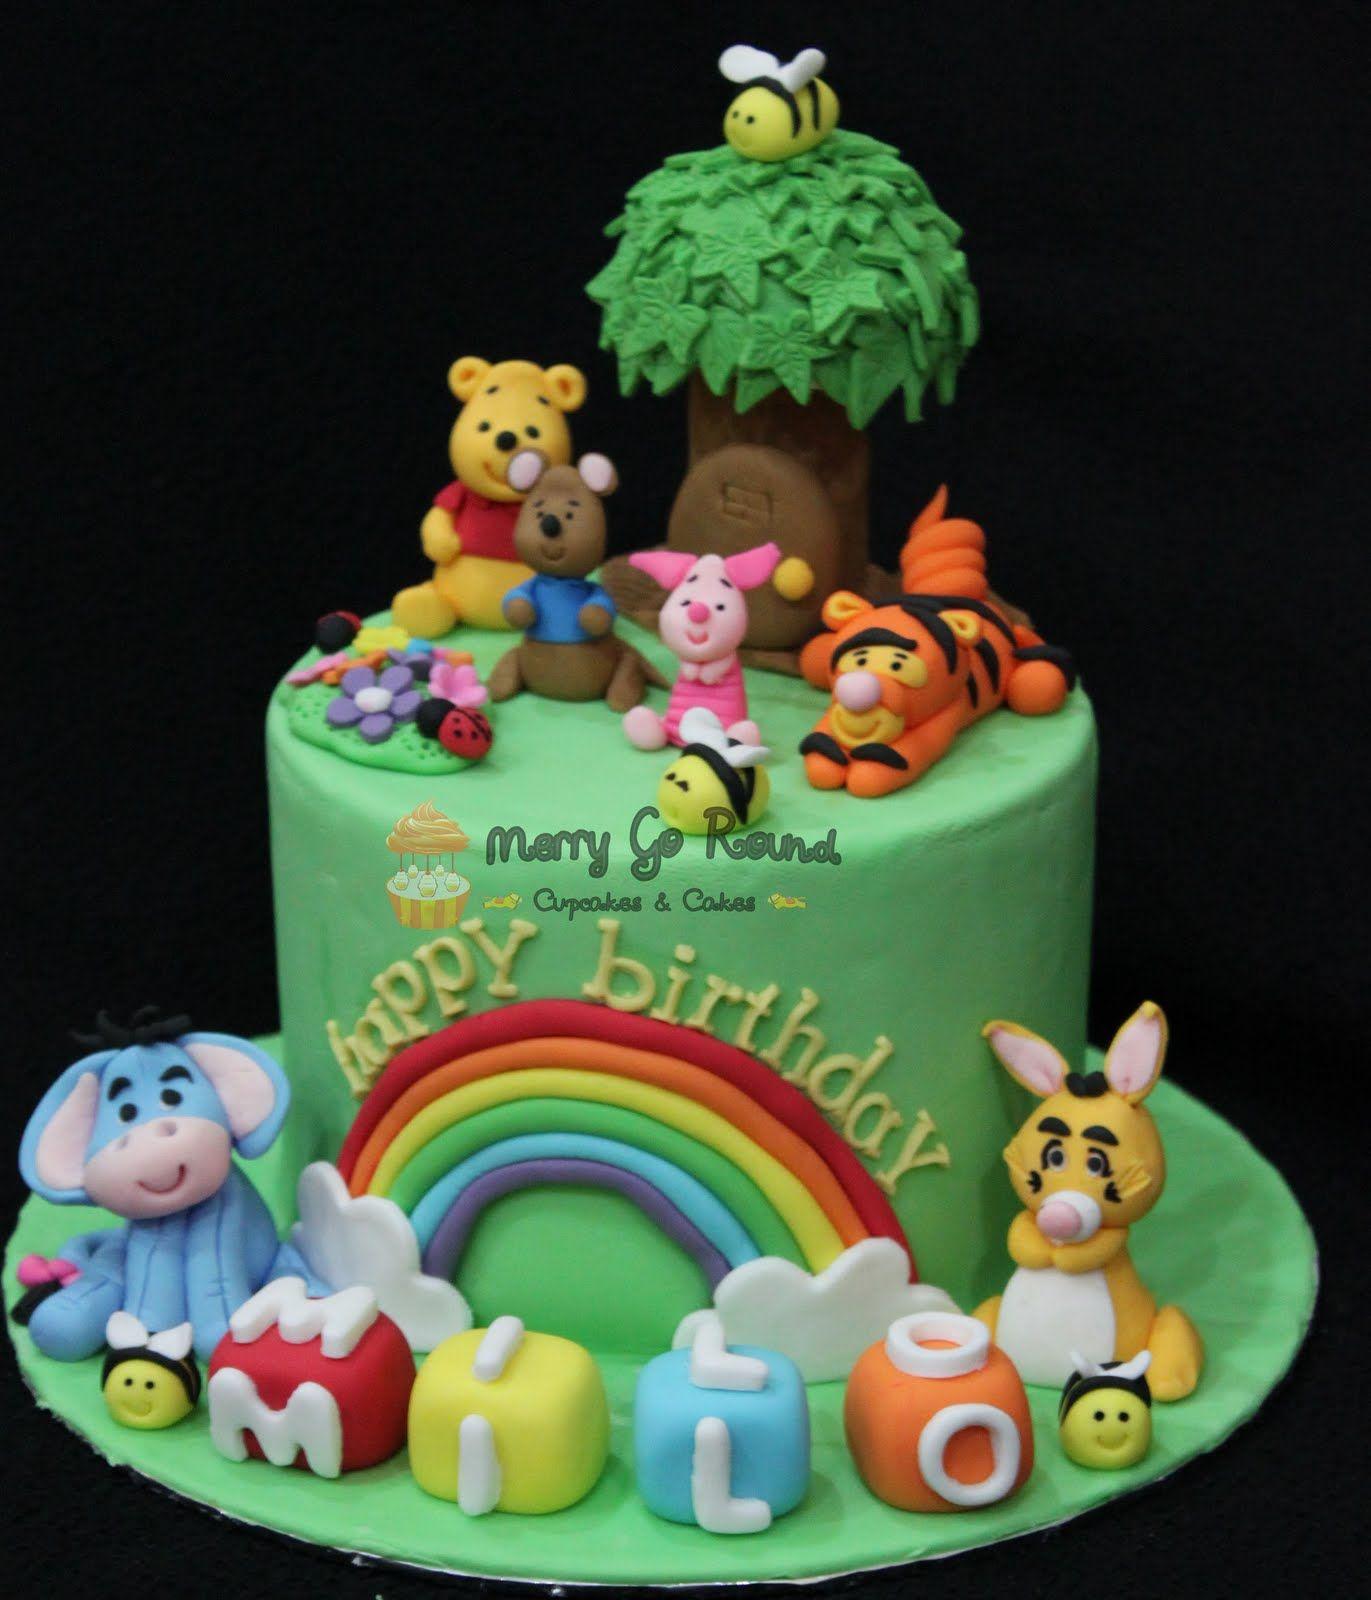 Merry Go Round Cupcakes amp Cakes Winnie The Pooh Birthday cakepins